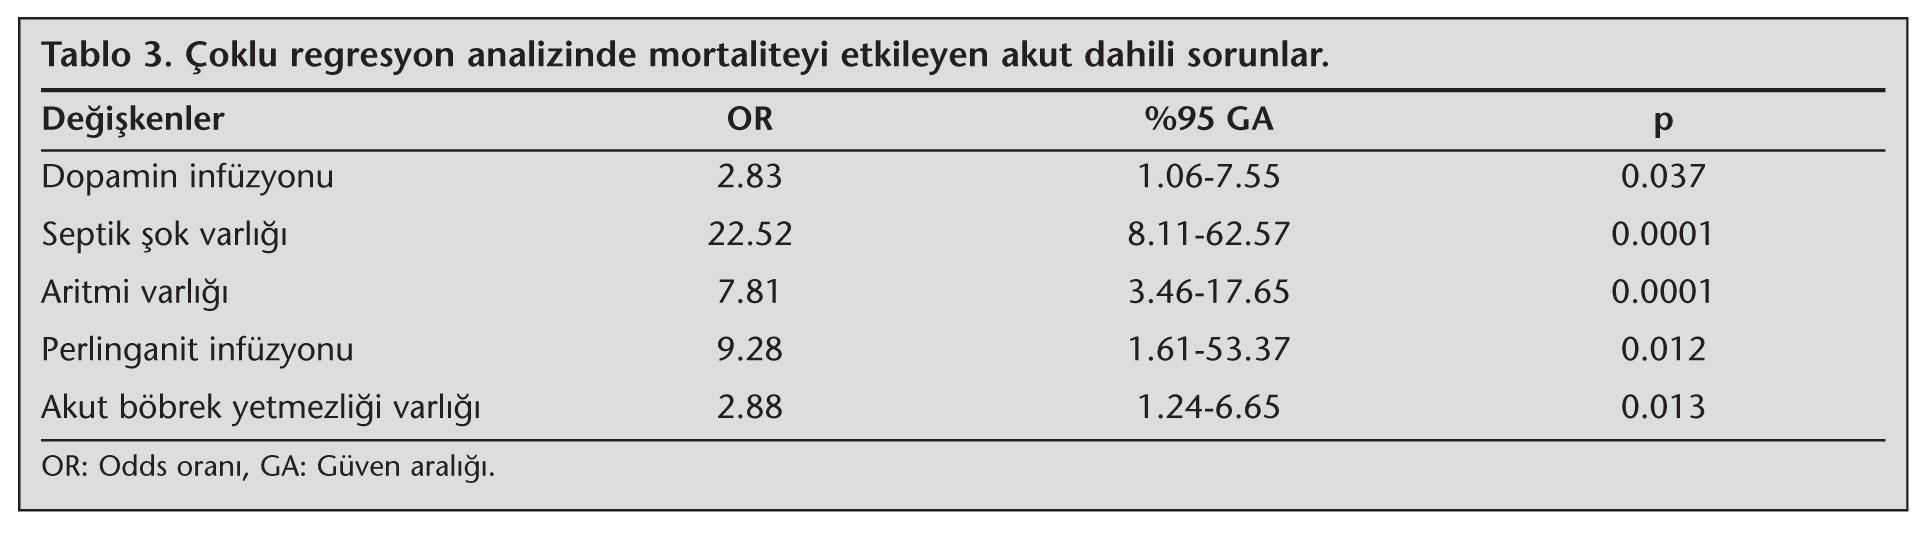 perlinganit infüzyonu protokolü